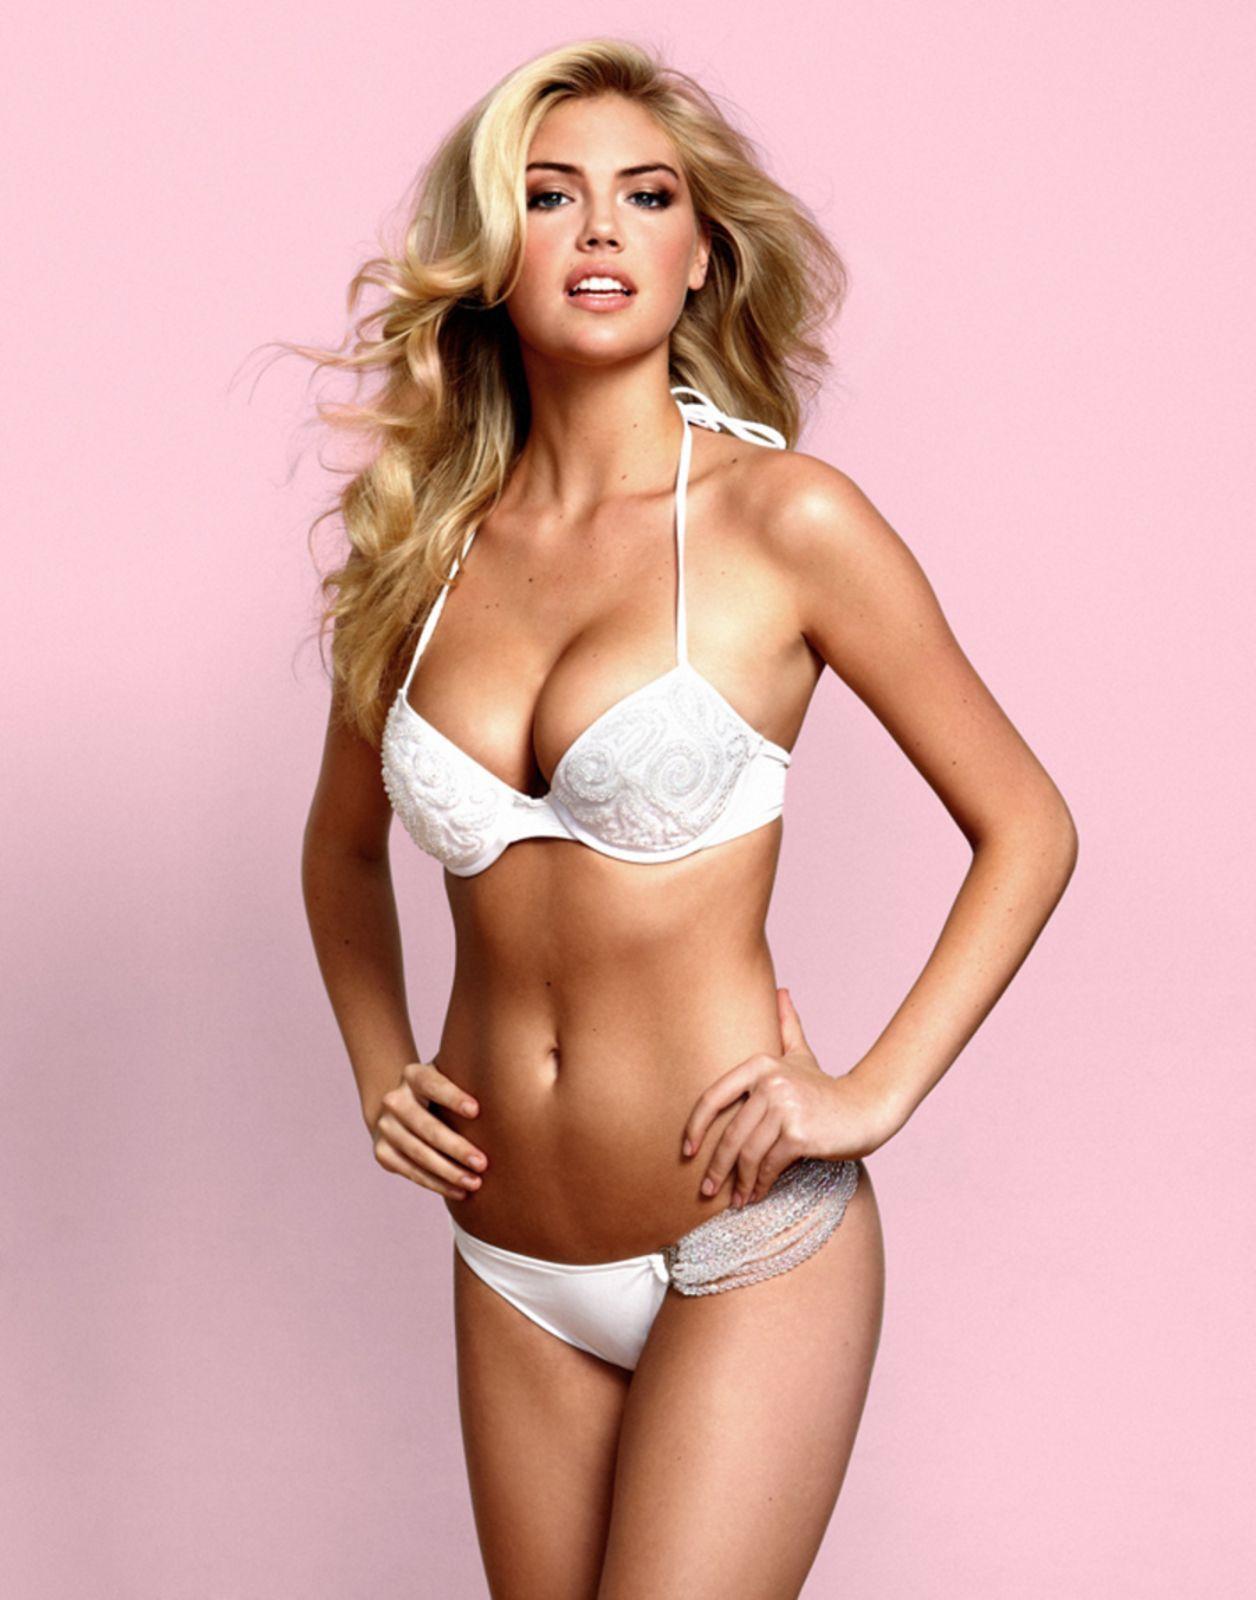 http://4.bp.blogspot.com/-BkHt-zxuHfc/TZ0wdY-NmpI/AAAAAAAAAlo/r1pYA5U6-Xo/s1600/Kate-Upton-White-Bikini-2.jpg